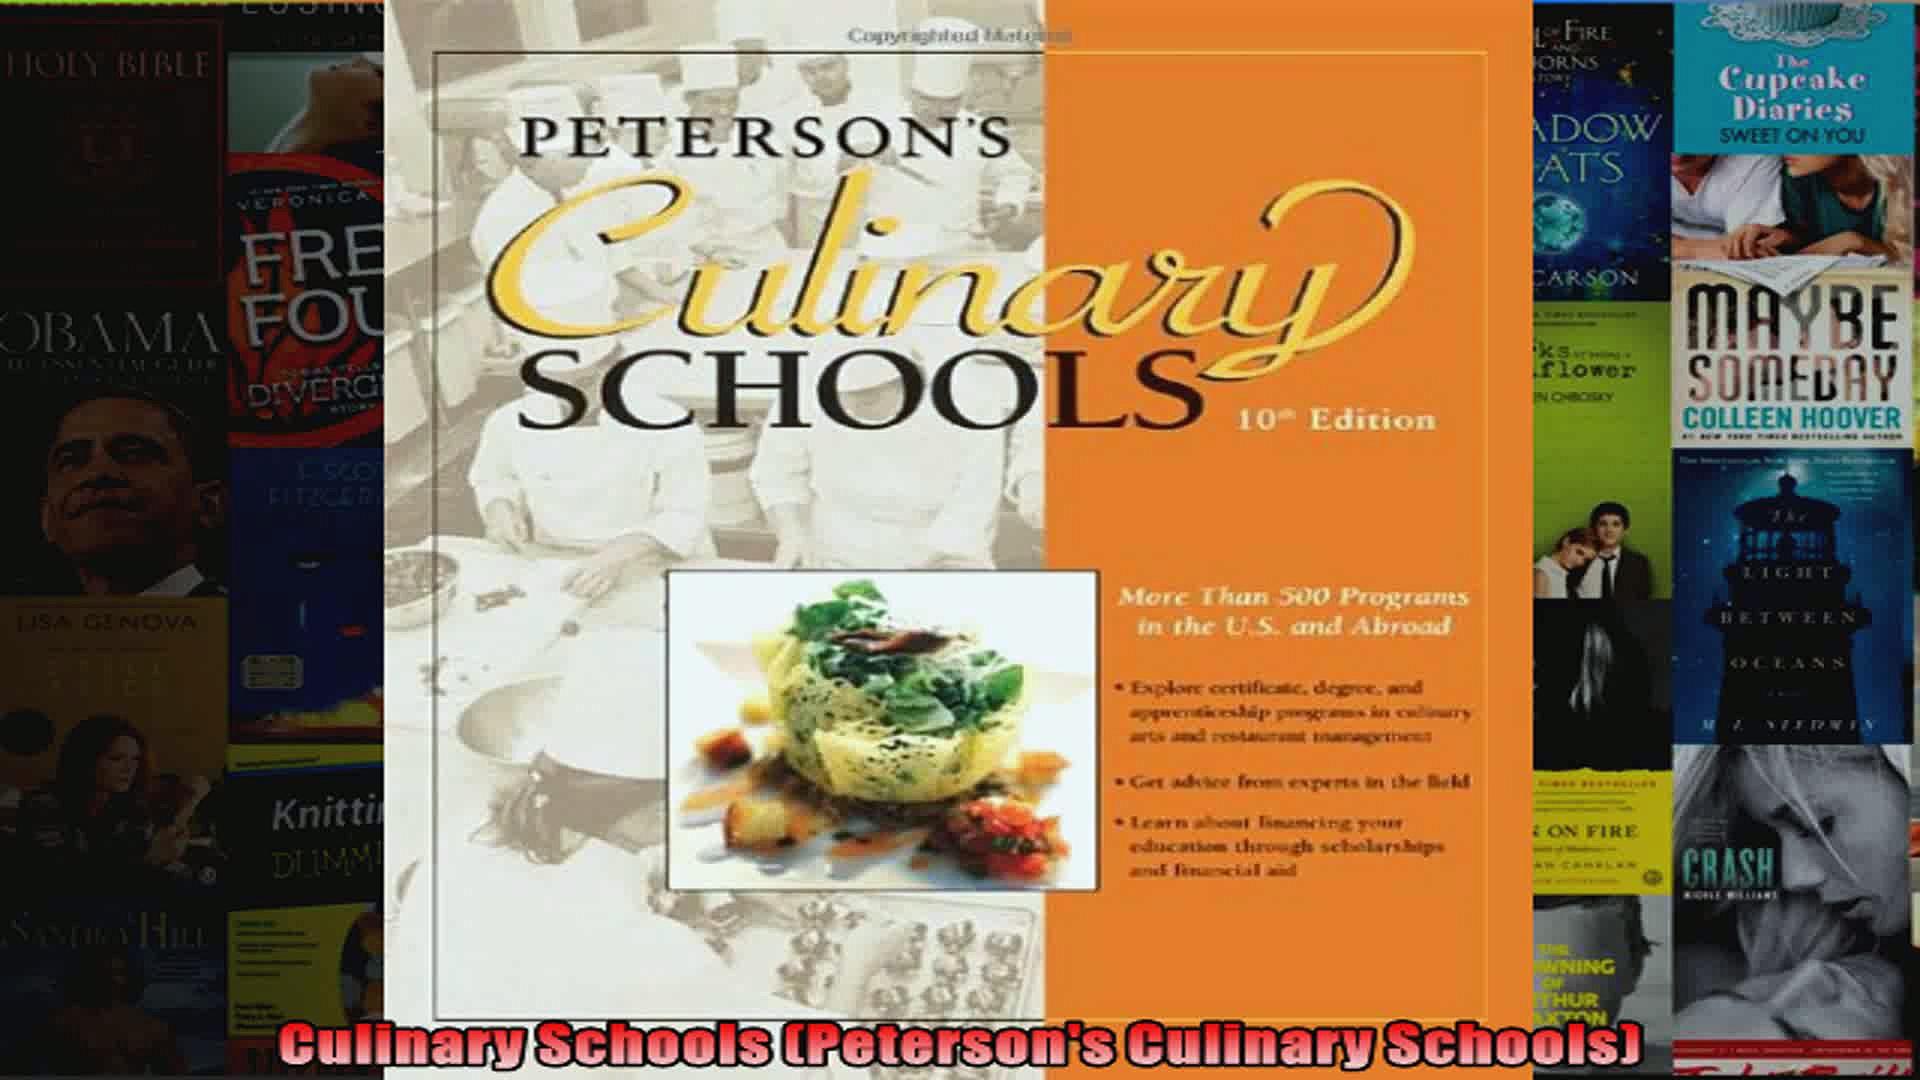 Culinary Schools Petersons Culinary Schools